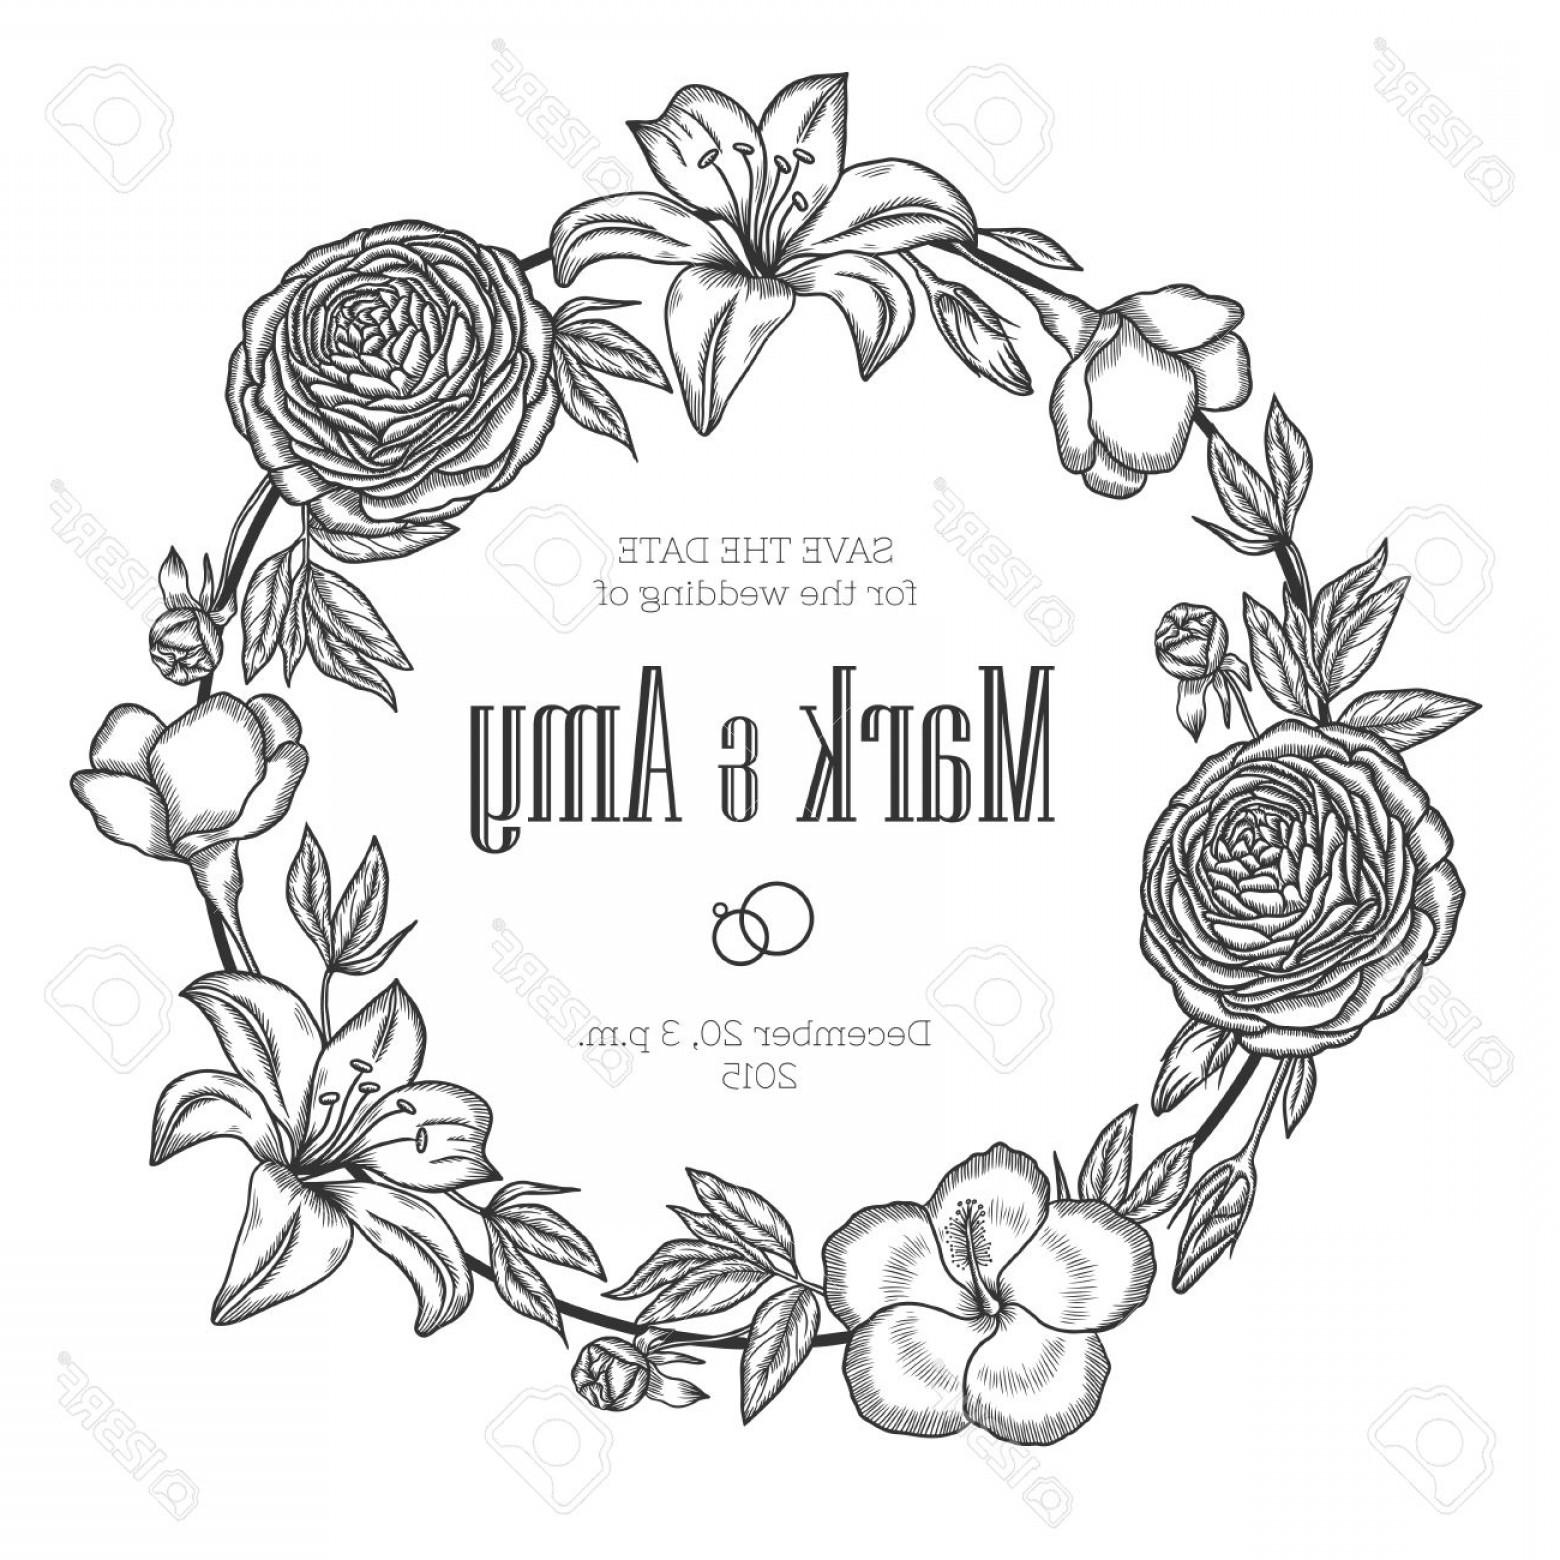 1560x1560 Floral Wreaths Vector Illustrations Lazttweet